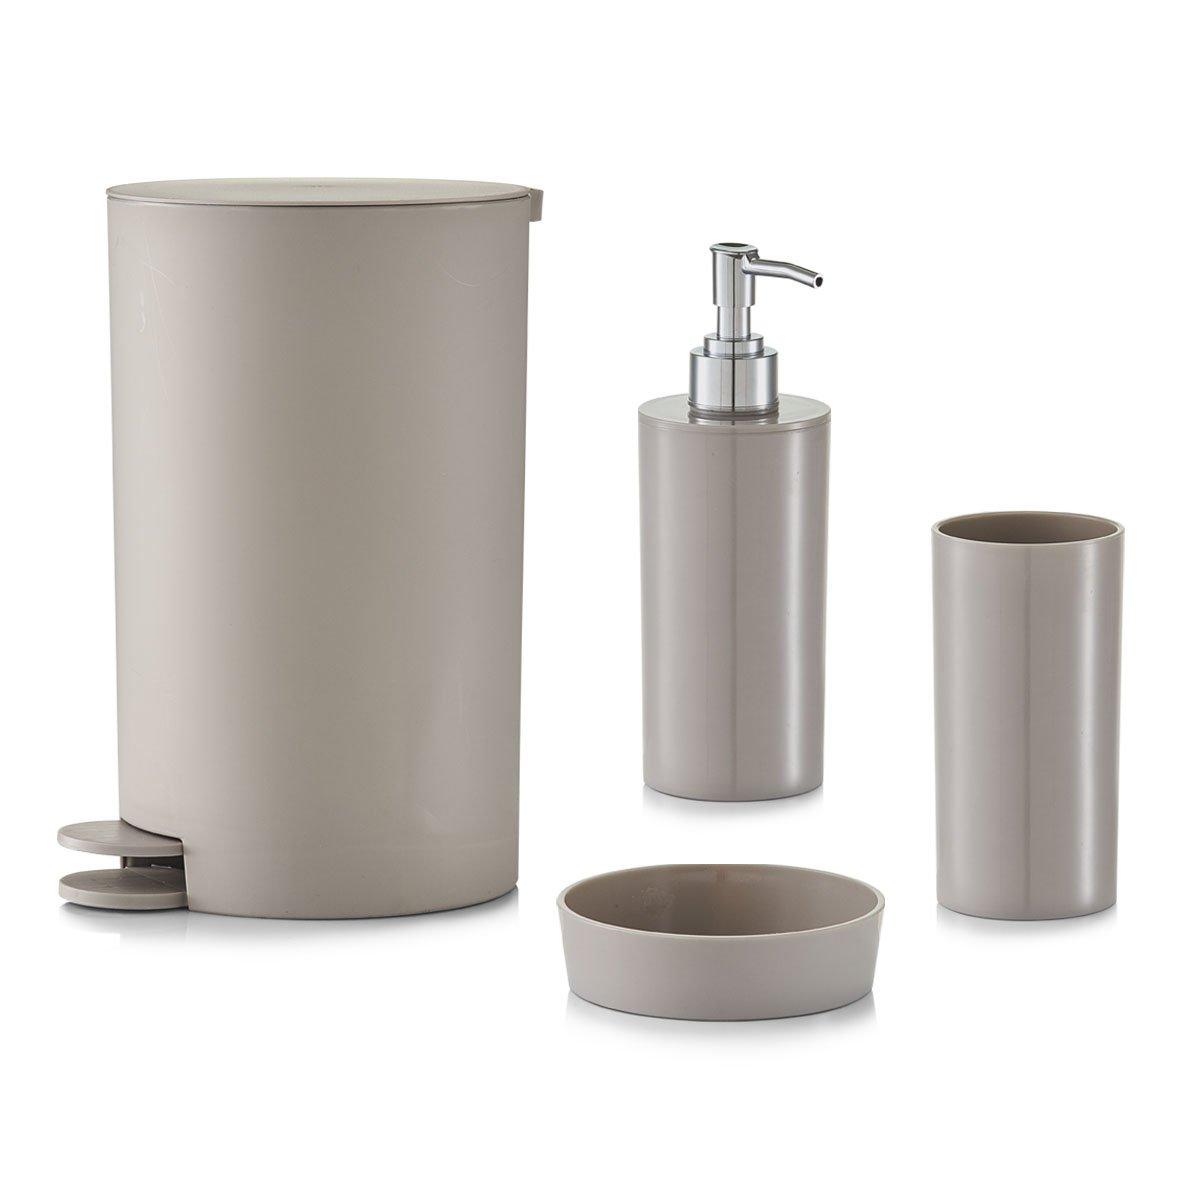 14,5x15,5x27cm in Taupe Zeller Bathroom Accessories Set 4pcs 14.5 x 15.5 x 27 cm